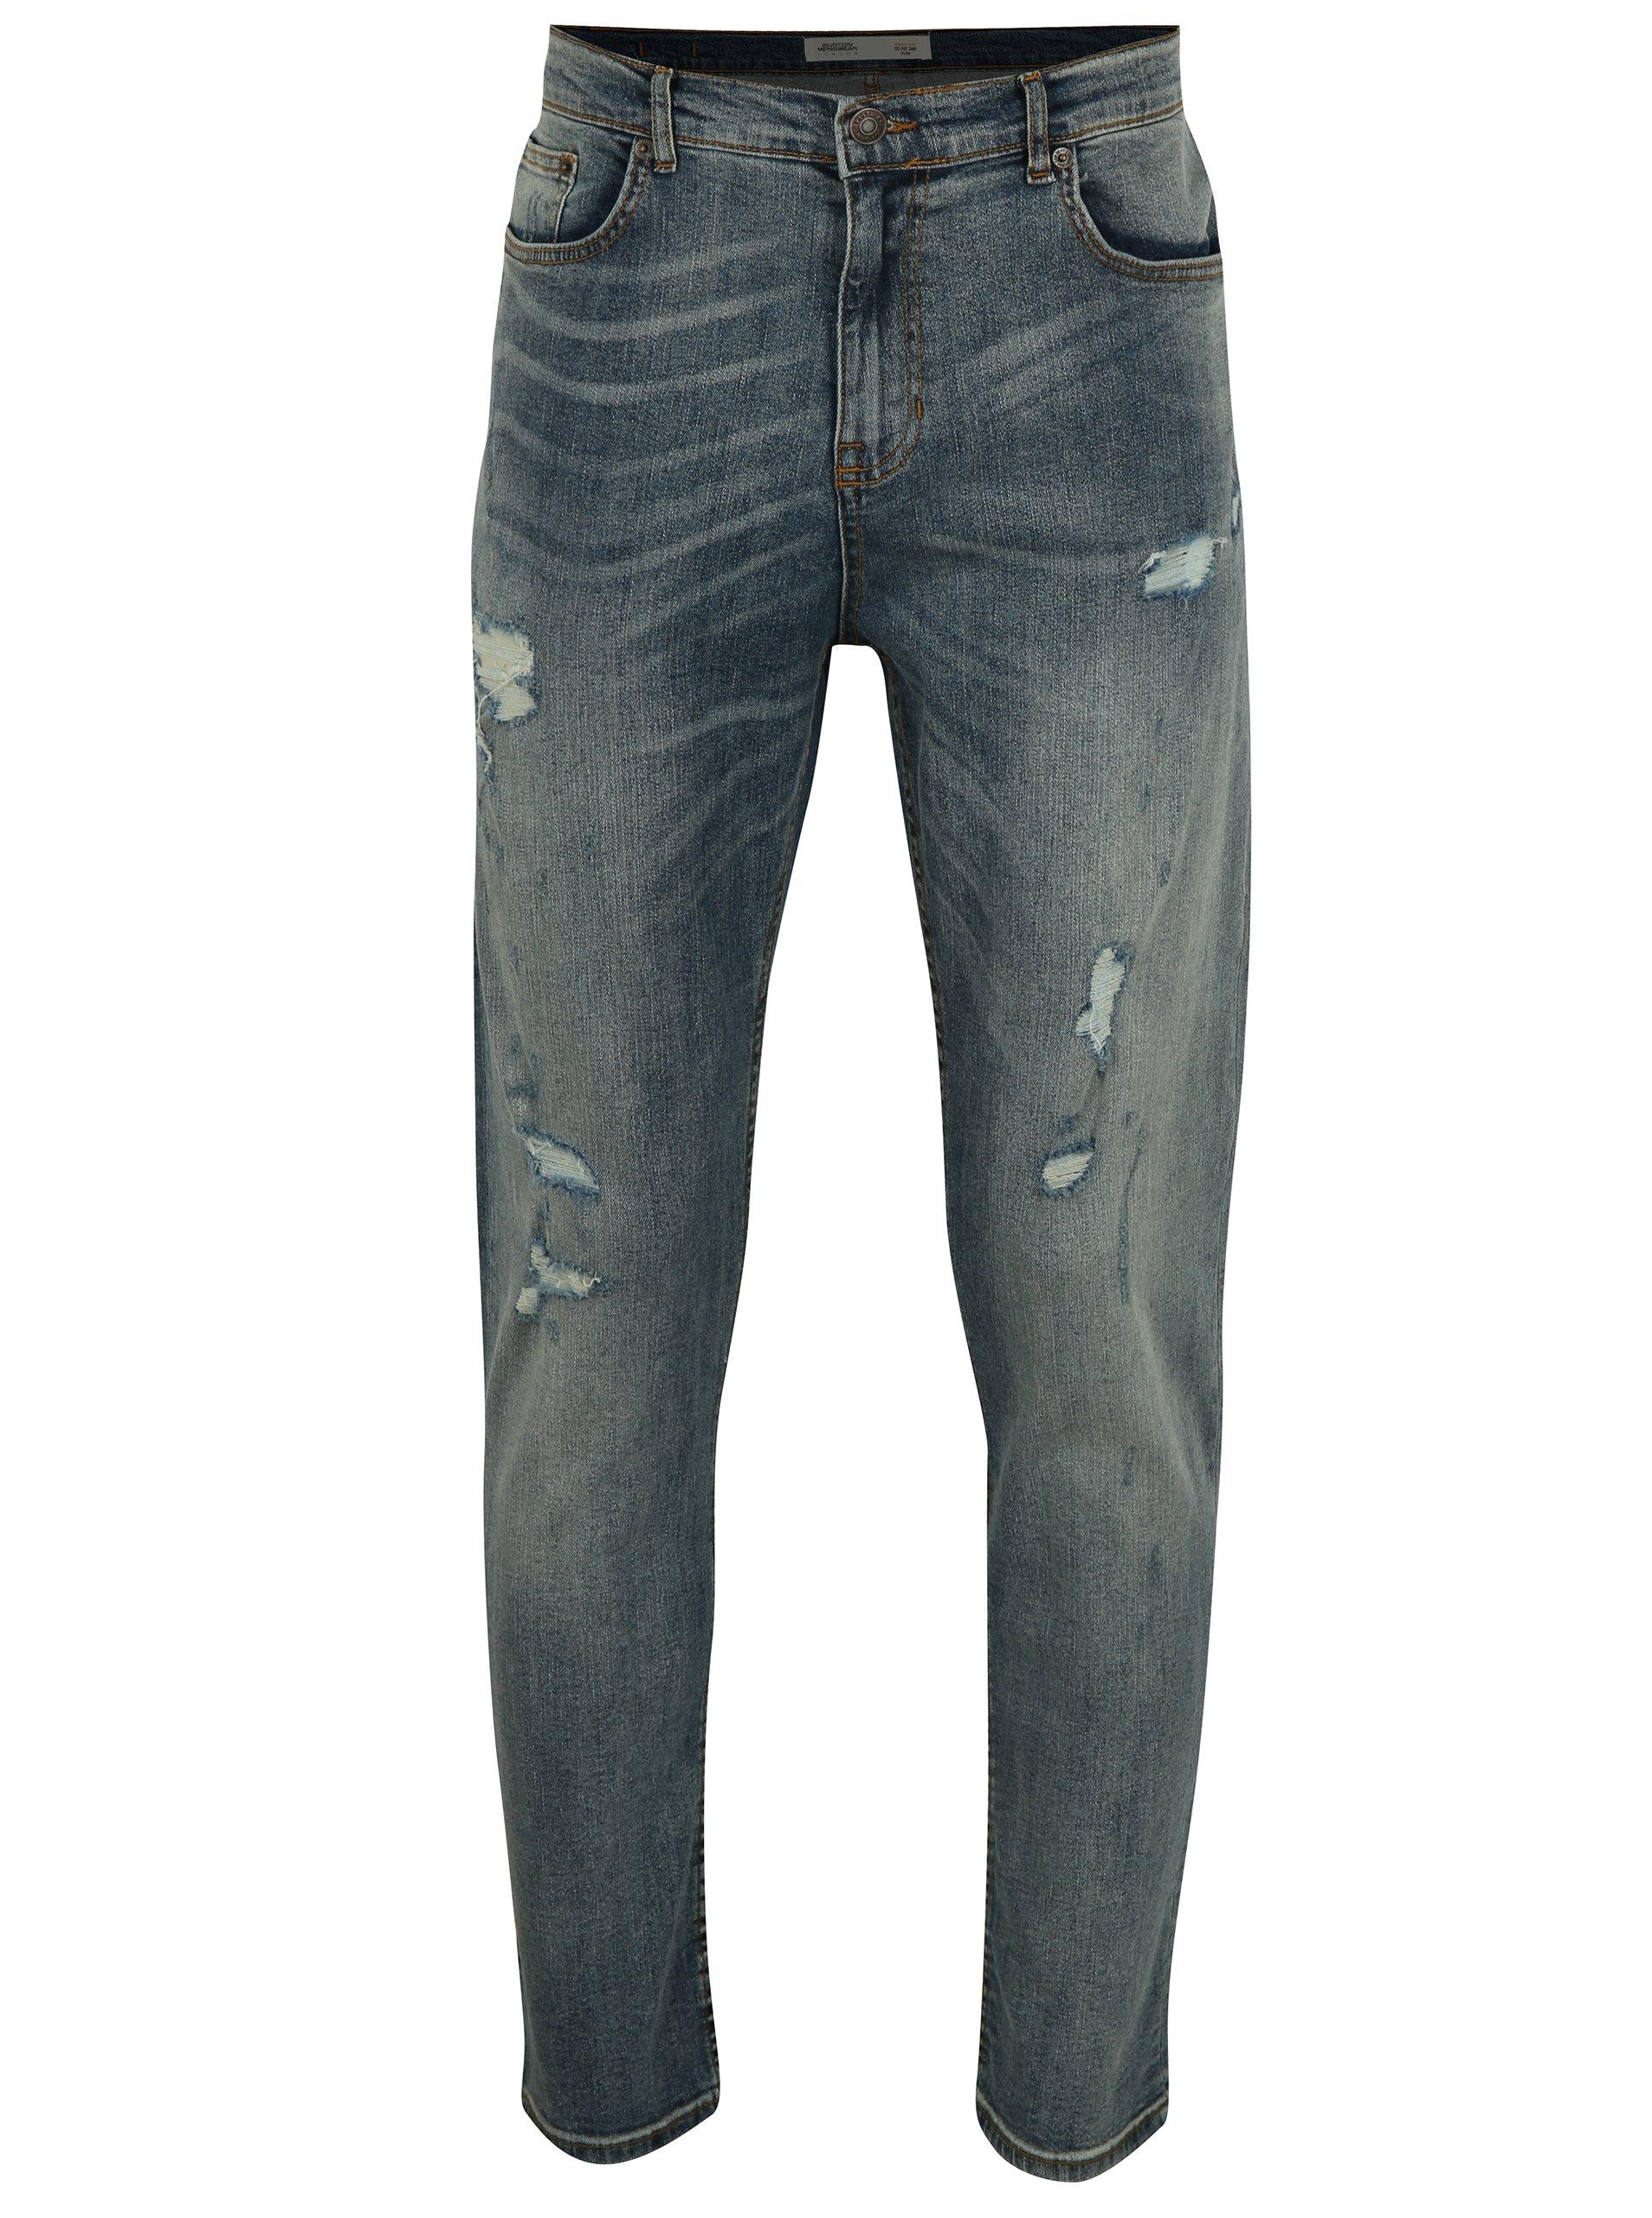 Modré slim fit džíny s potrhaným efektem Burton Menswear London